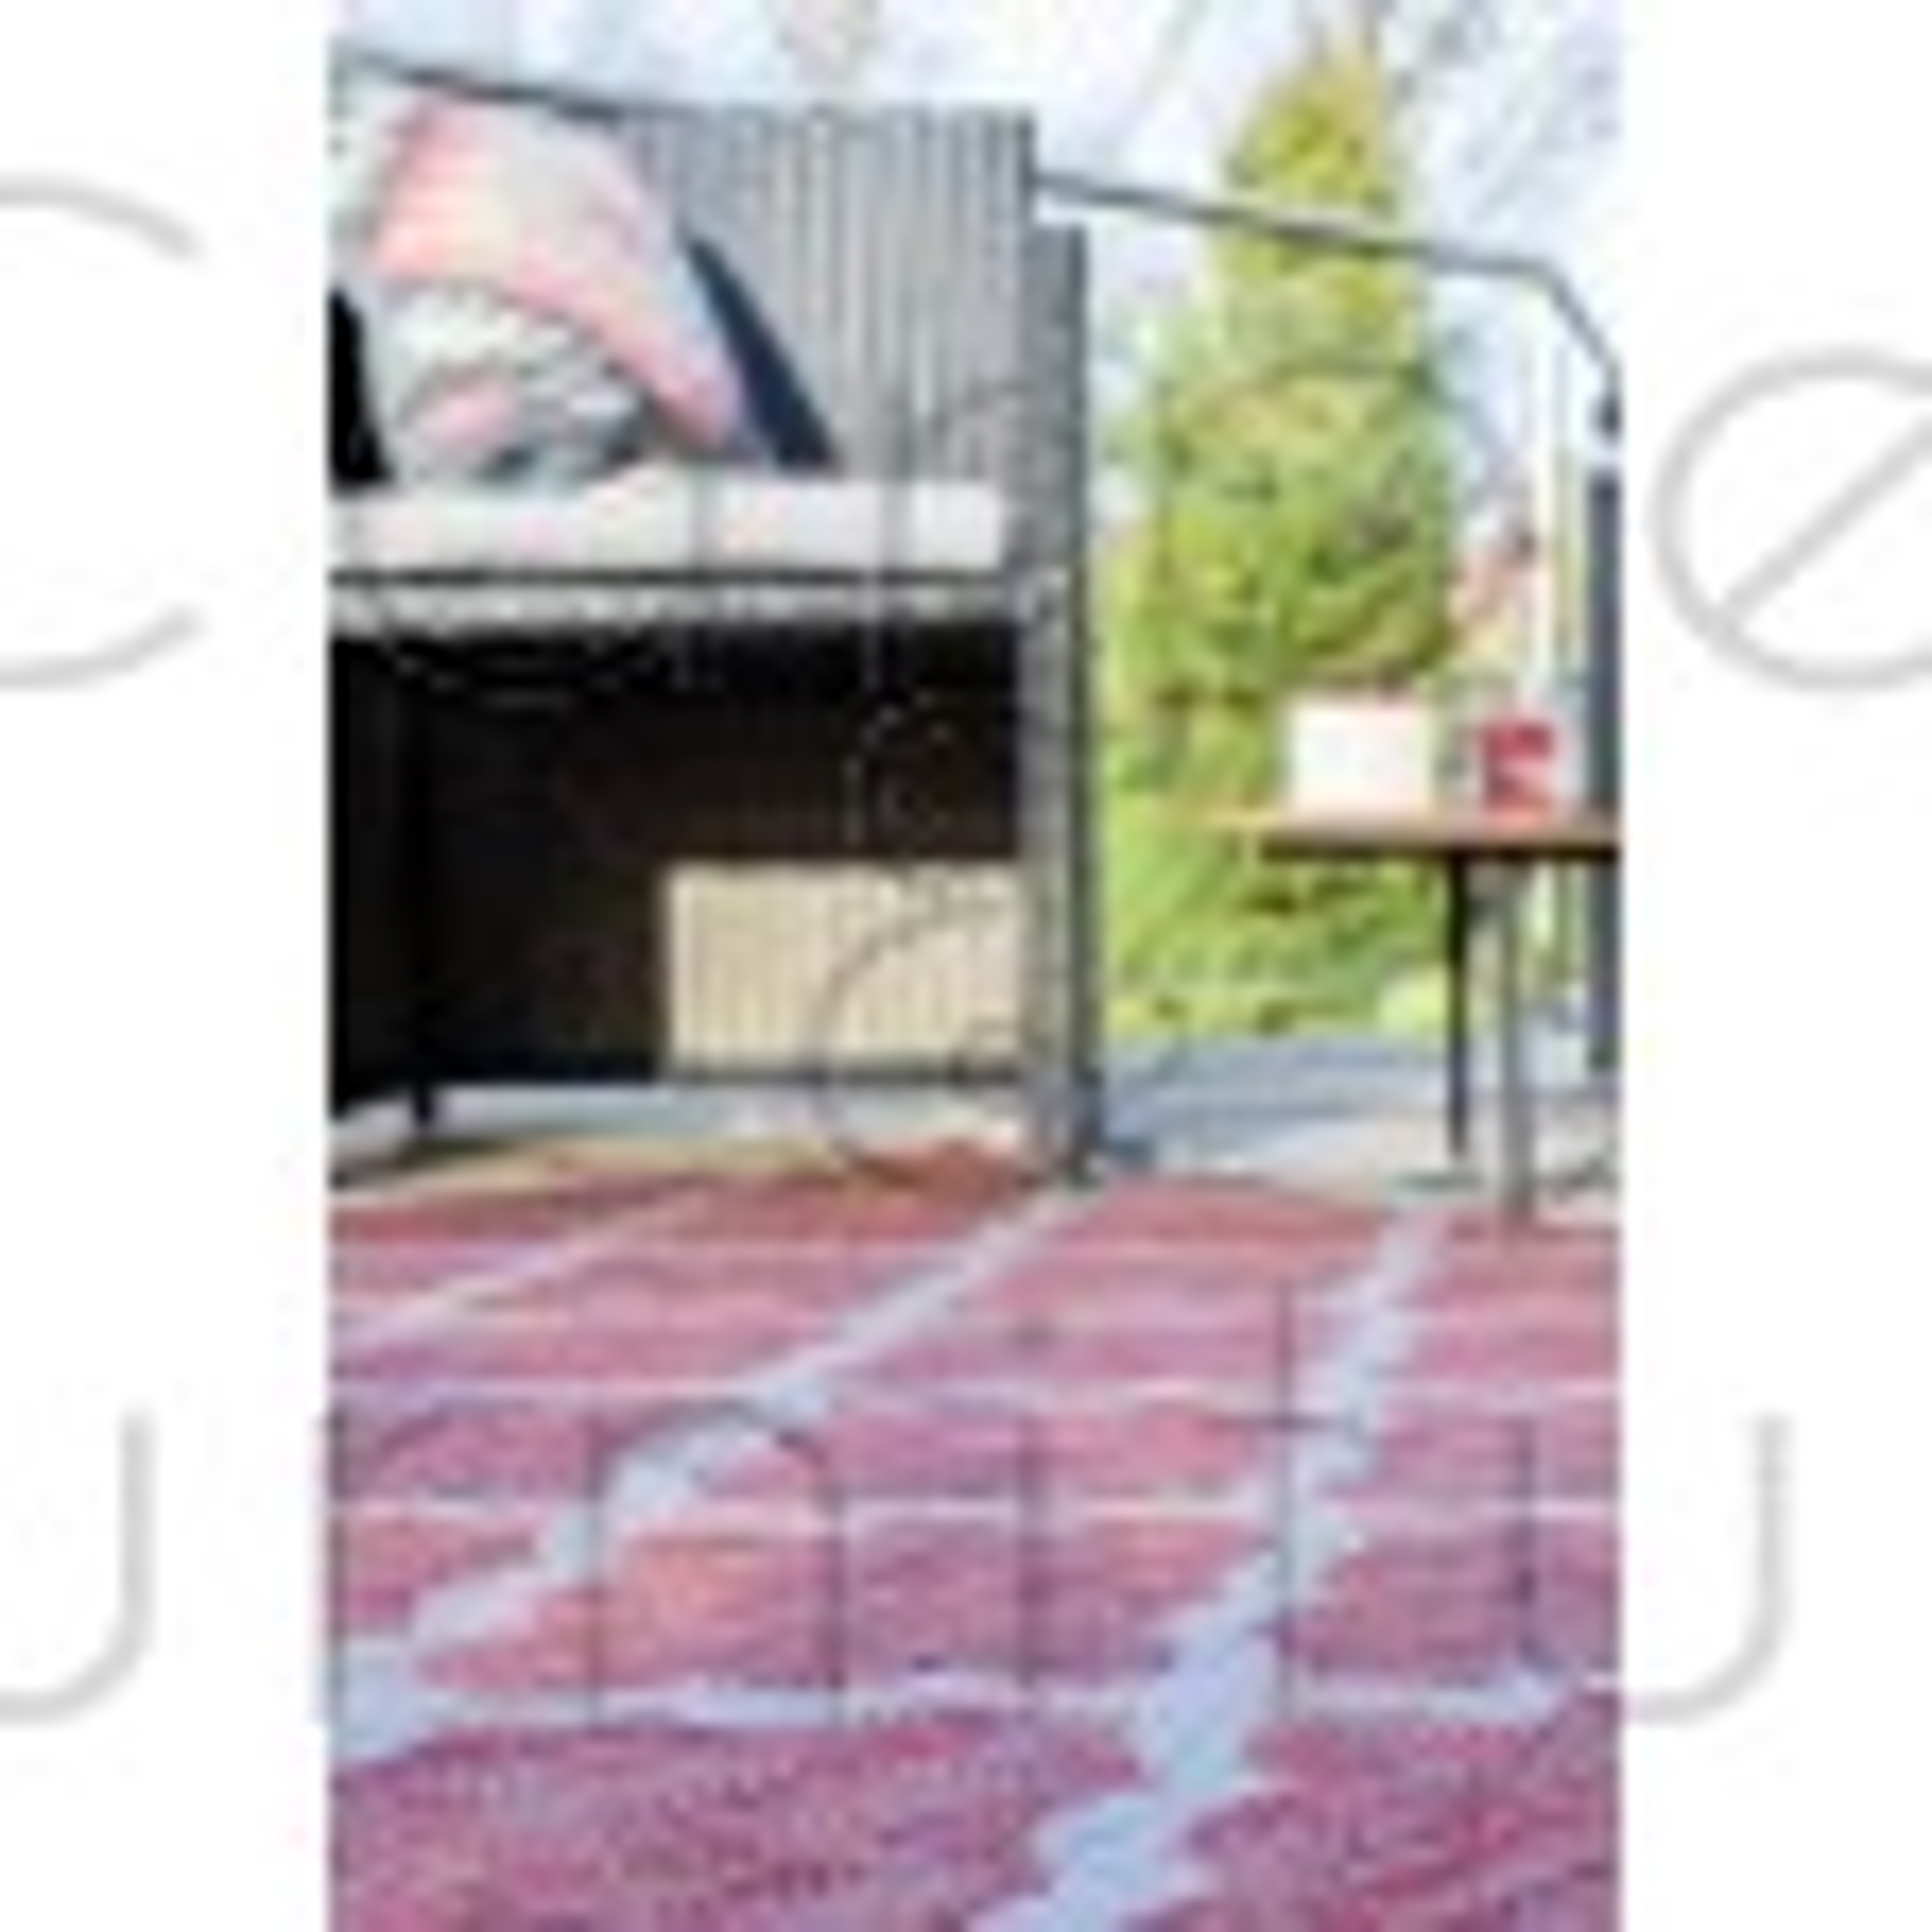 "Florence Alfresco Padua Rug - Red Beige - Size 120 x 170 cm (4' x 5'7"")"